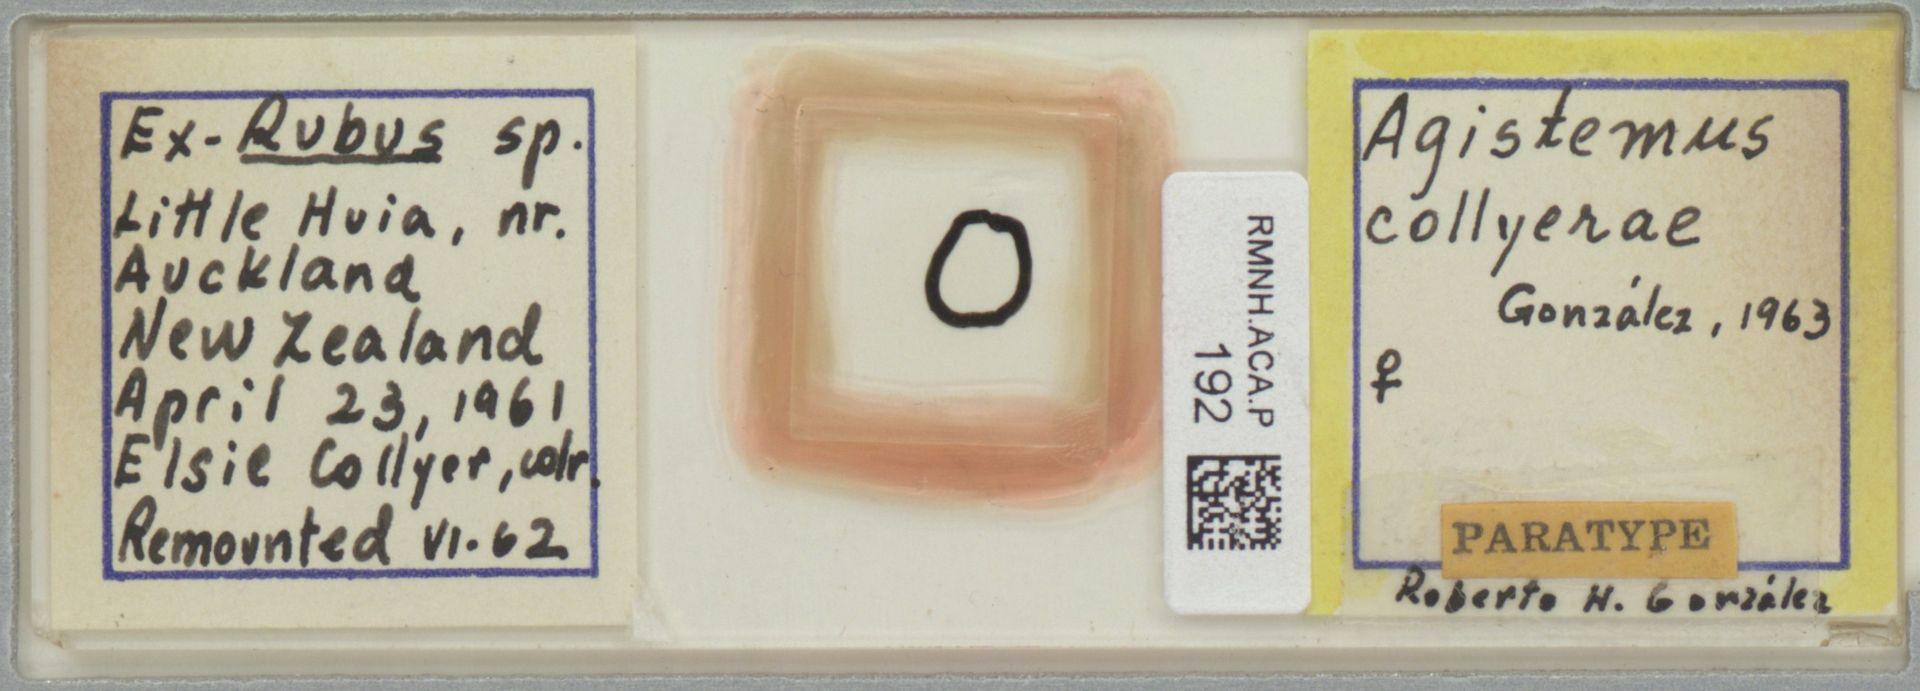 RMNH.ACA.P.192 | Agistemus collyerae González, 1963